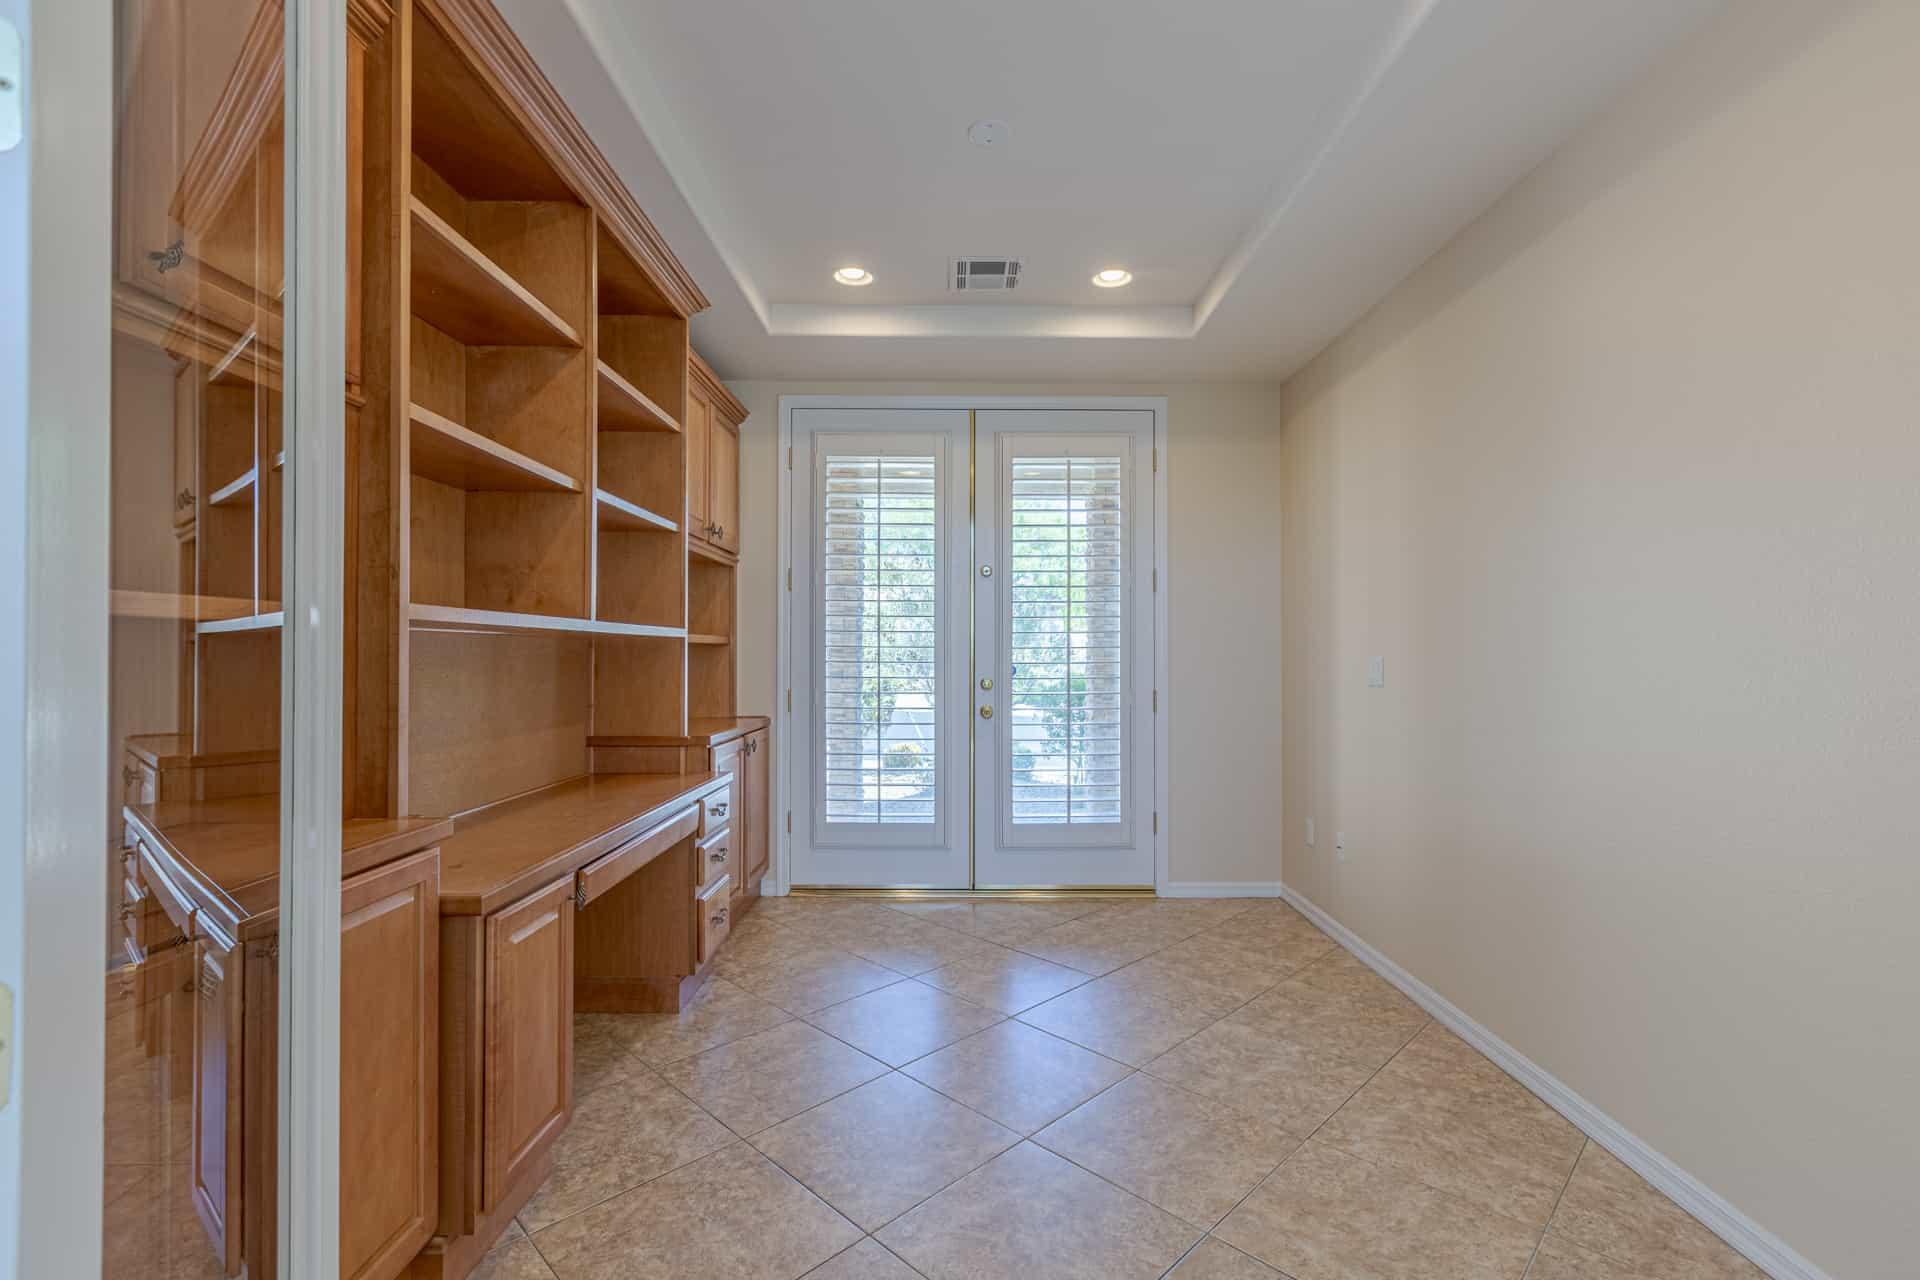 las-vegas-luxry-real-estate-realtor-rob-jensen-company-10729-grey-havens-court-willow-creek1157